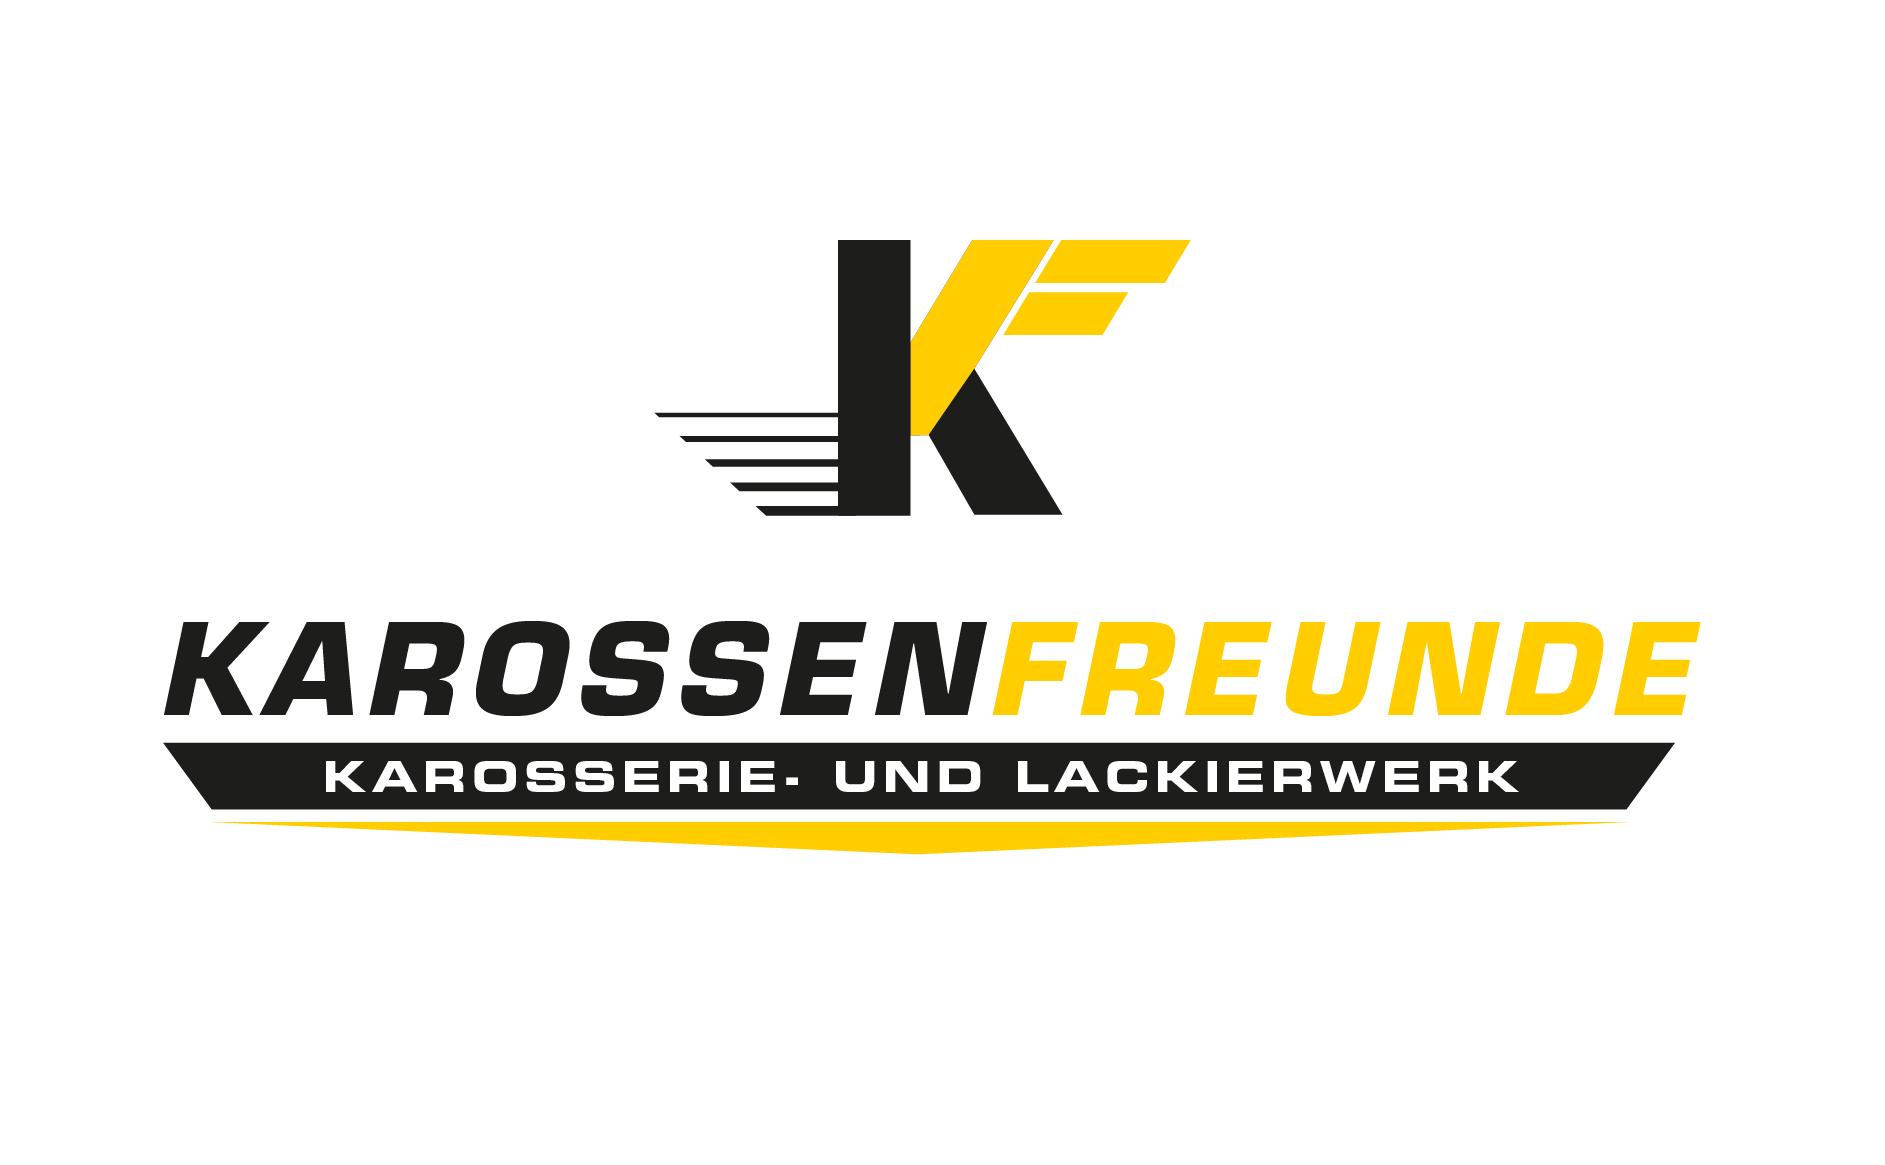 Karossenfreunde